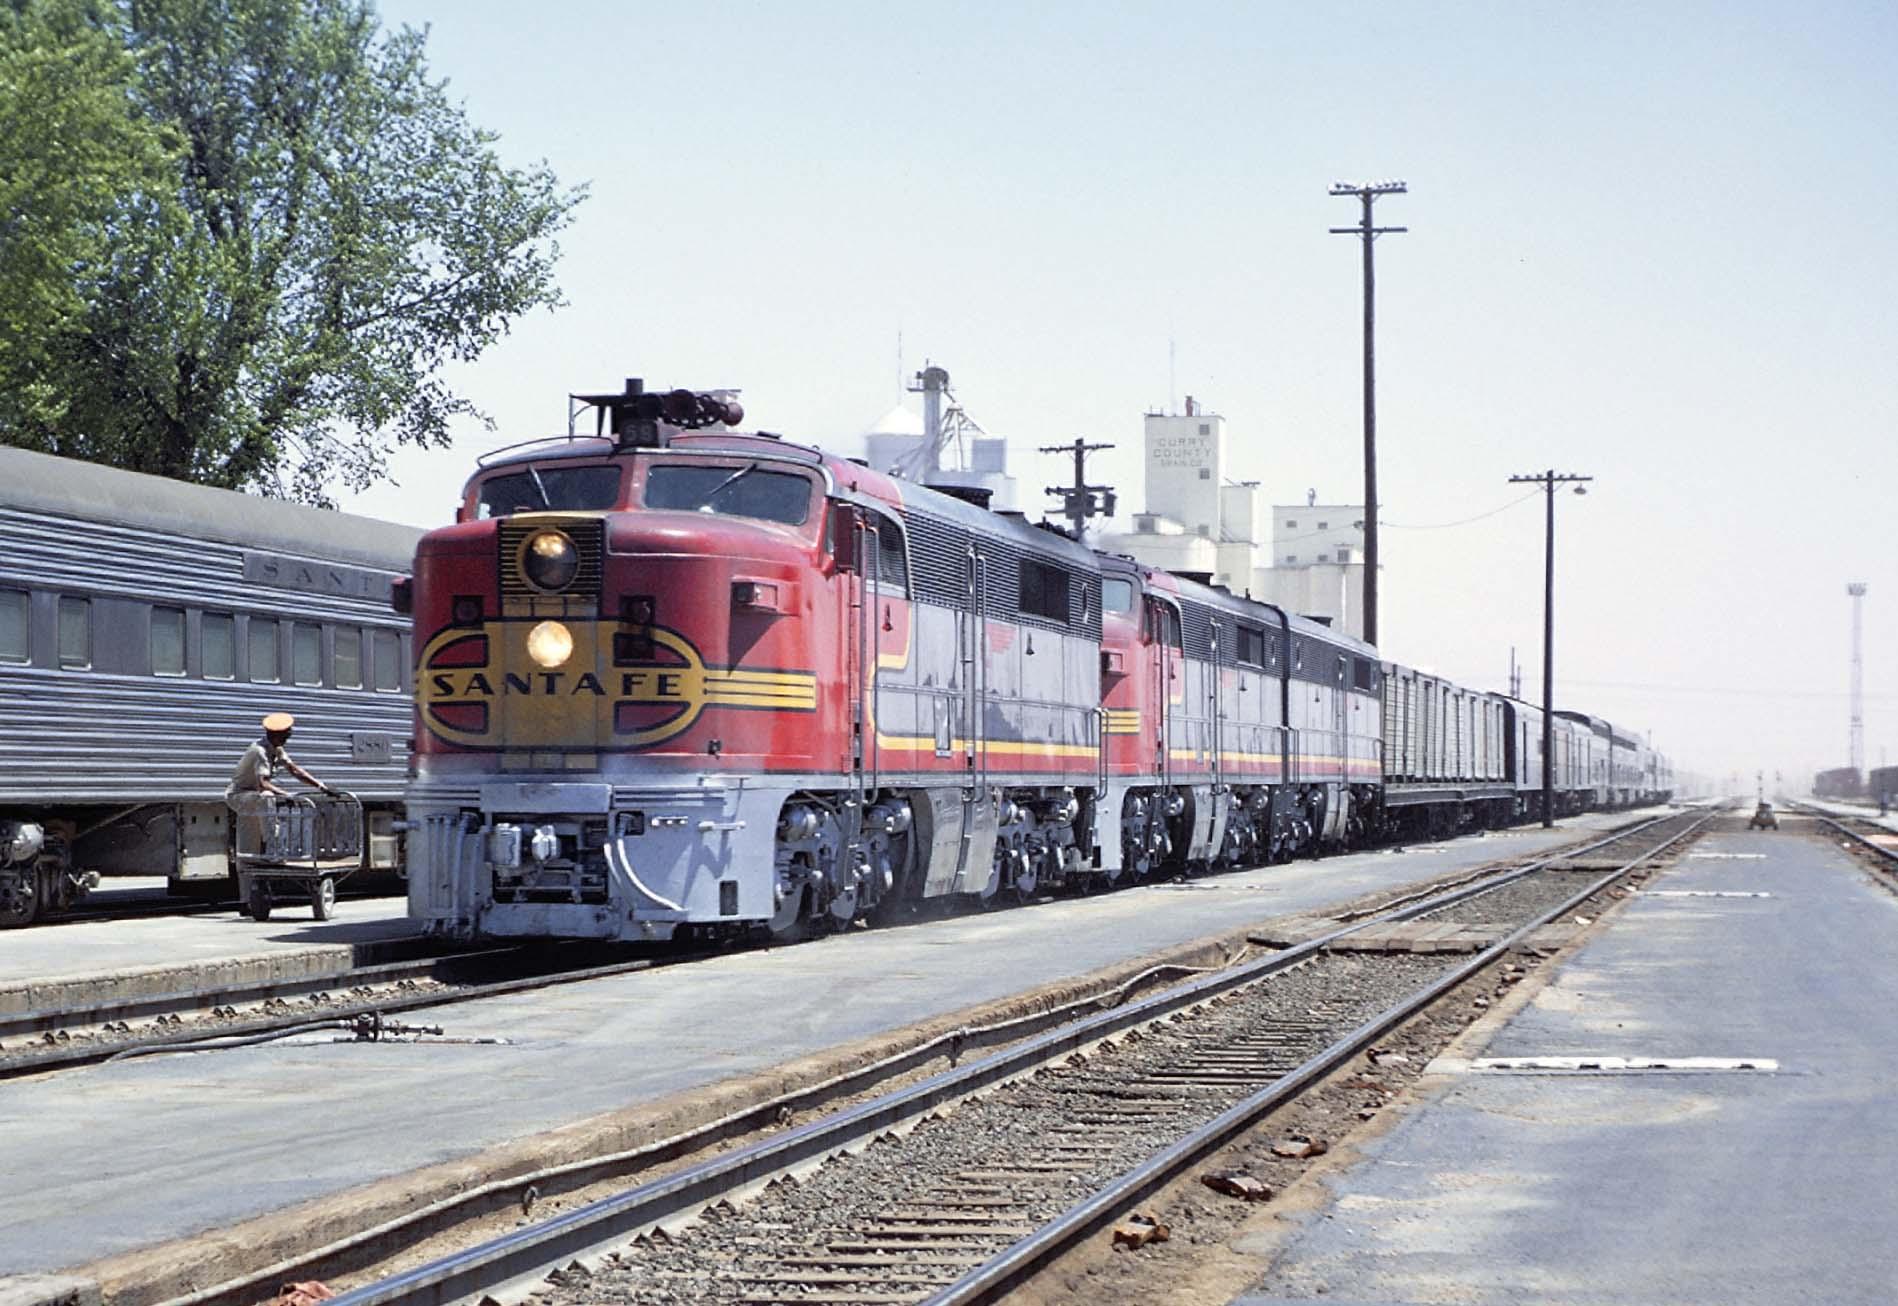 Diesel locomotives with Santa Fe San Francisco Chief passenger train at station